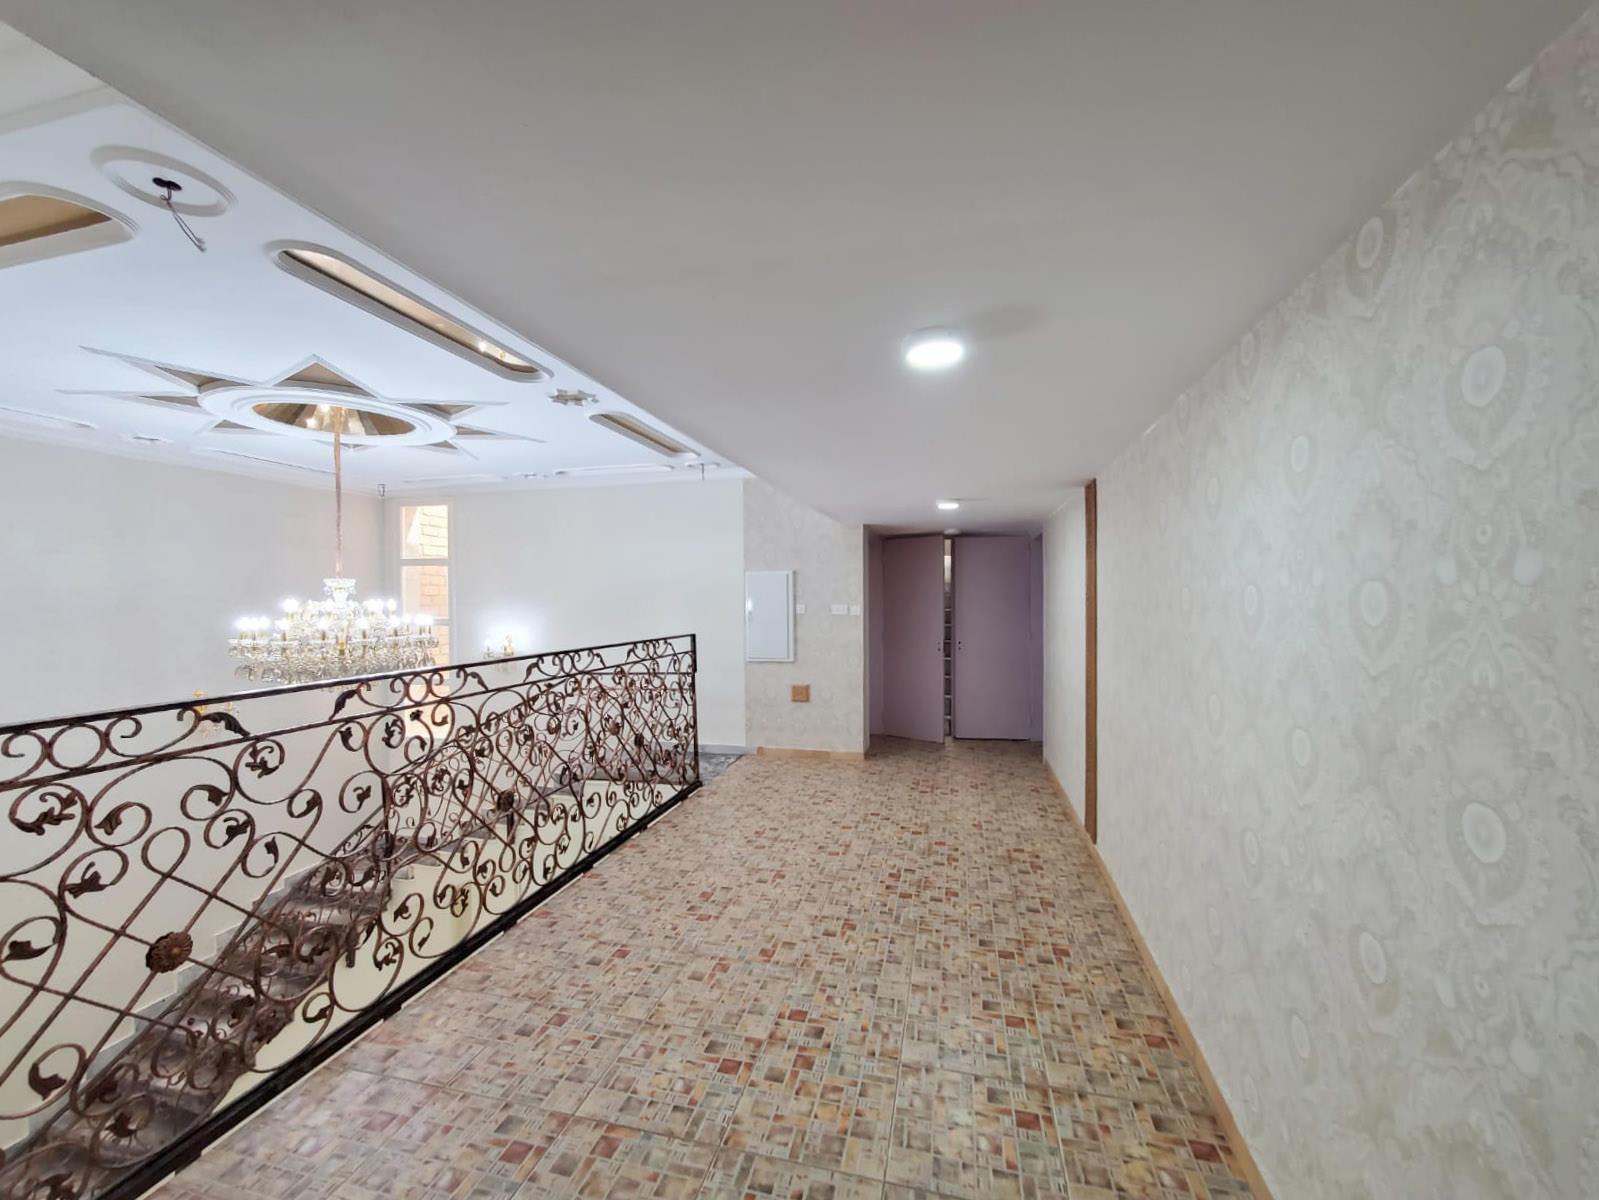 Sabah Al Salem – spacious, partially furnished 5 bedroom duplex